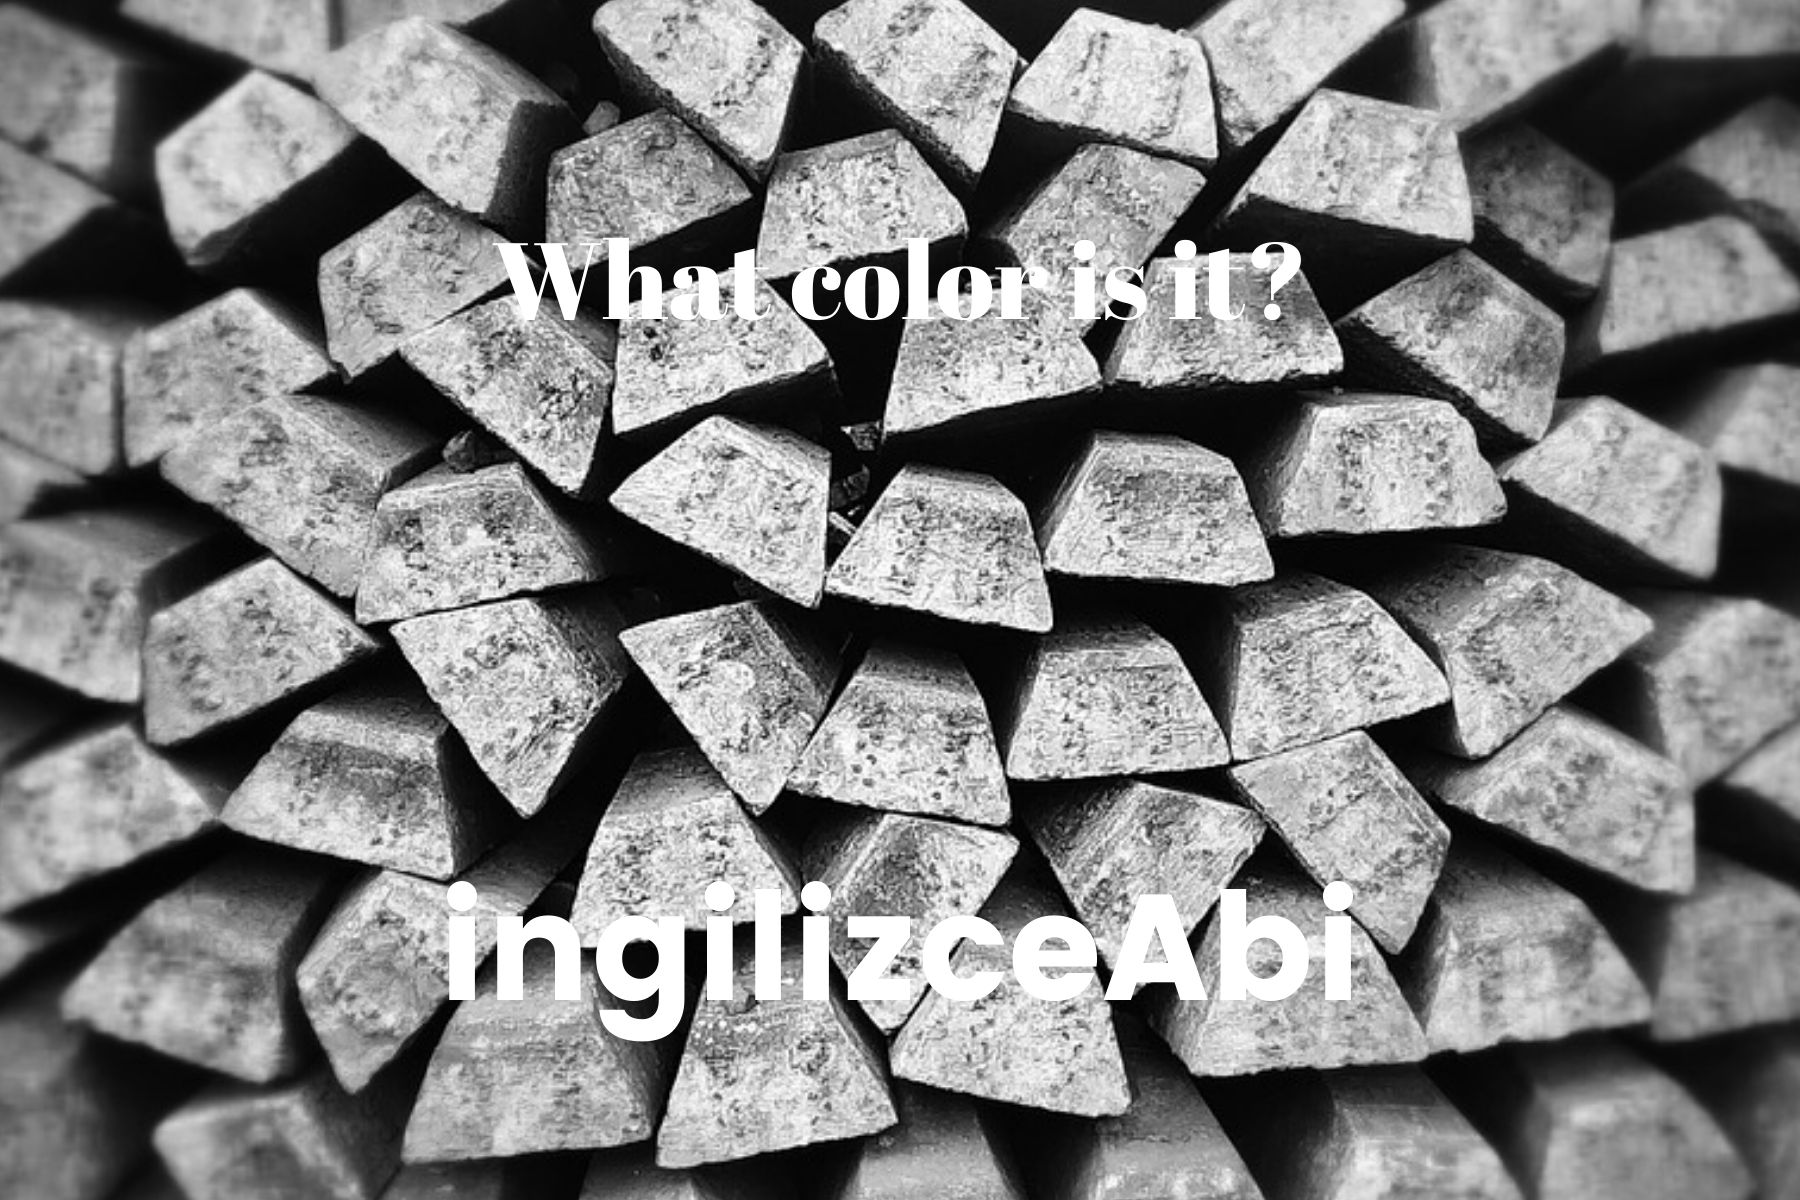 Silver Color - - ingilizce renkler - ingilizceabi